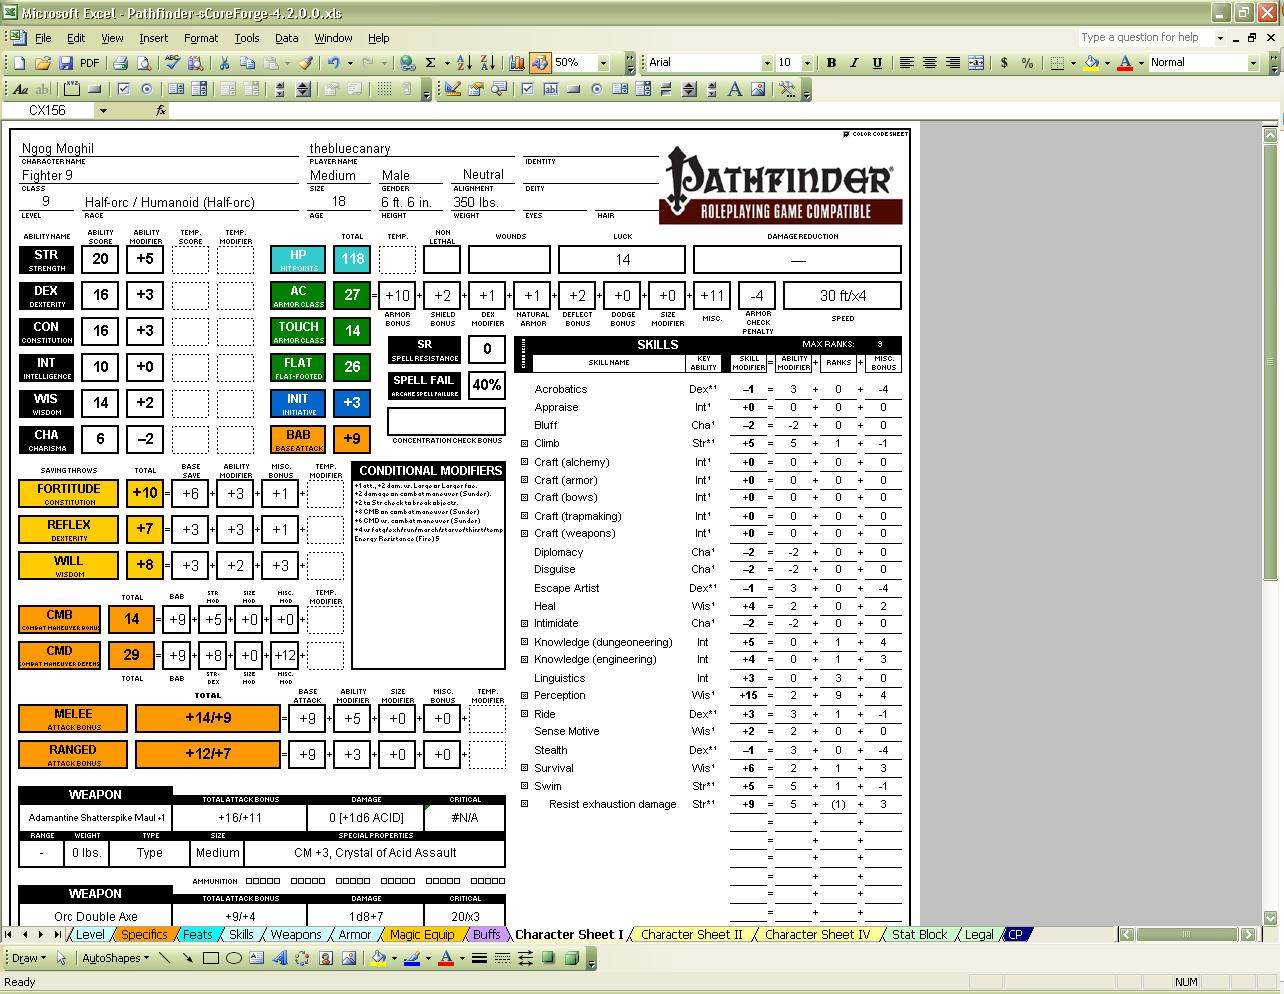 pathfinder inventory sheet